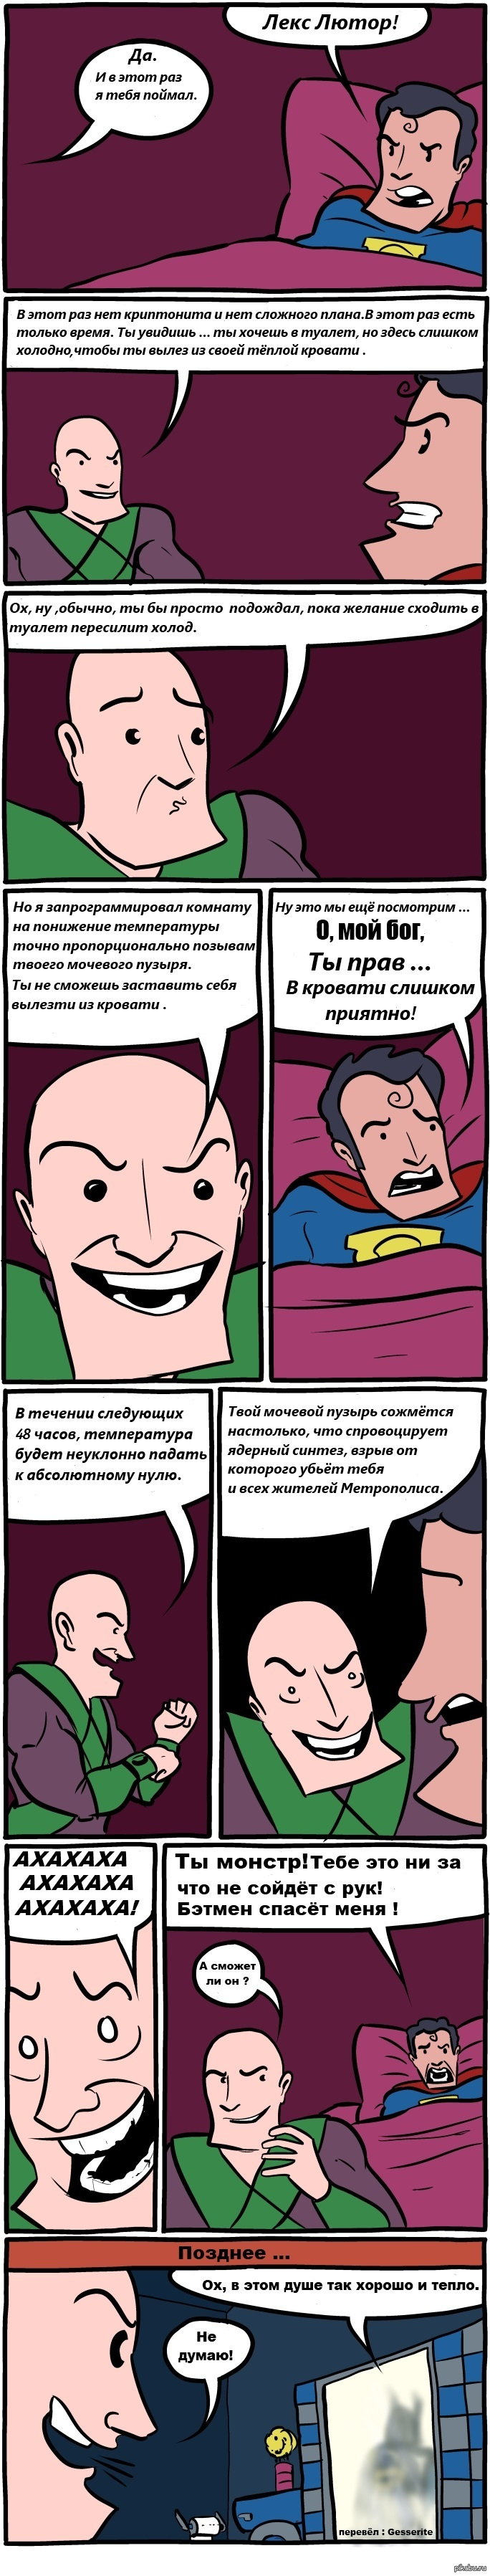 Лекс Лютор vs Супергероев!